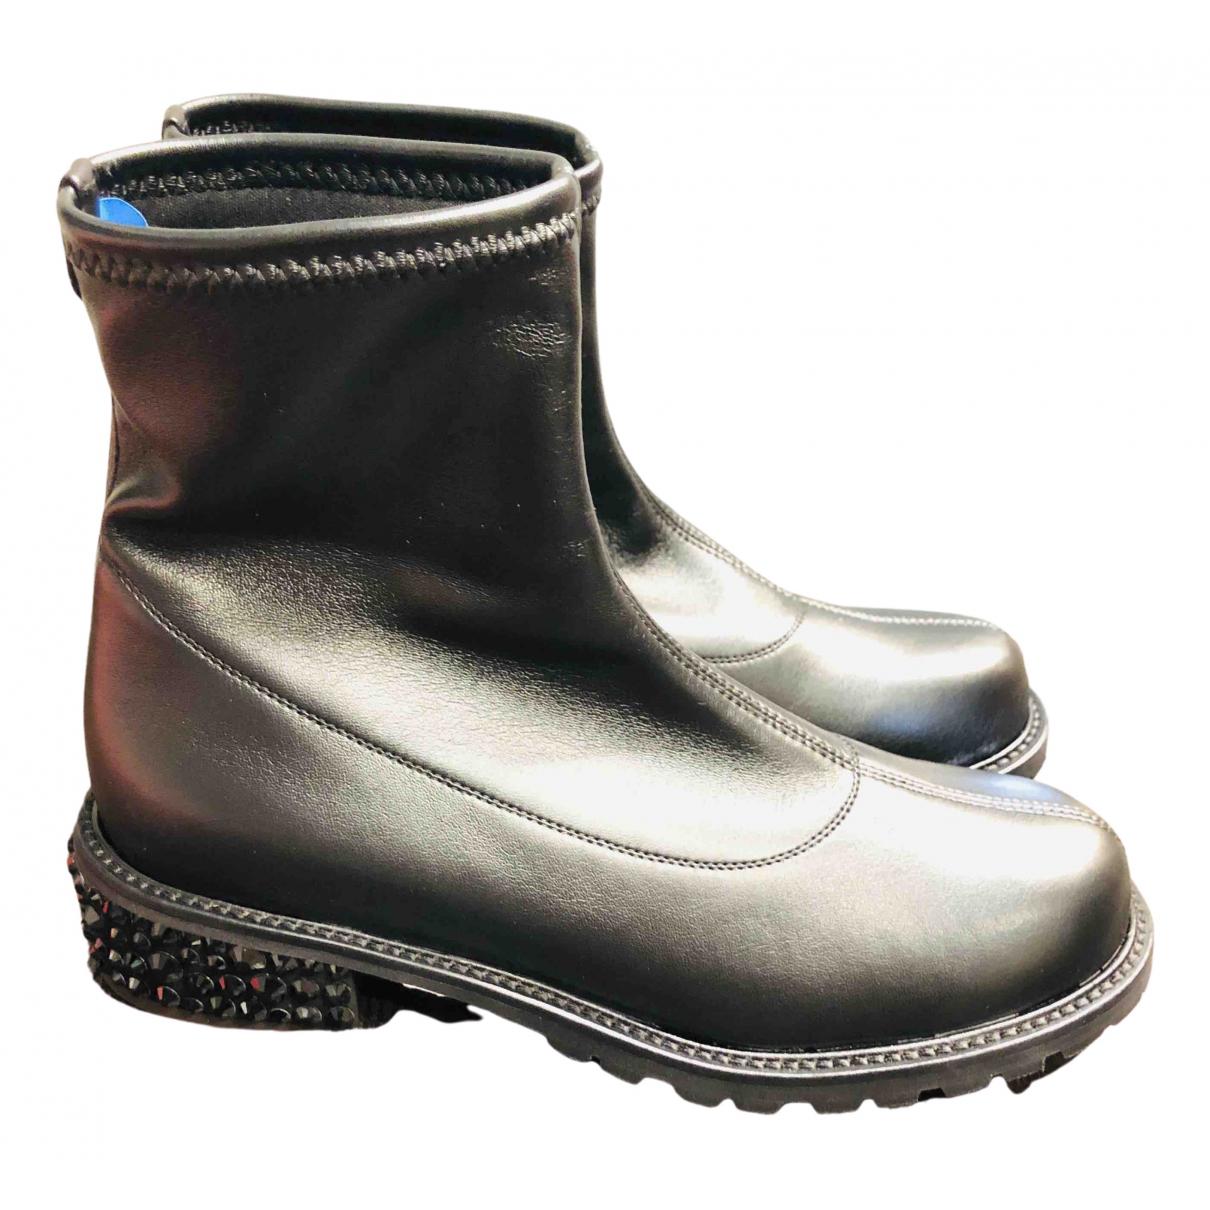 Giuseppe Zanotti \N Black Leather Ankle boots for Women 36.5 EU